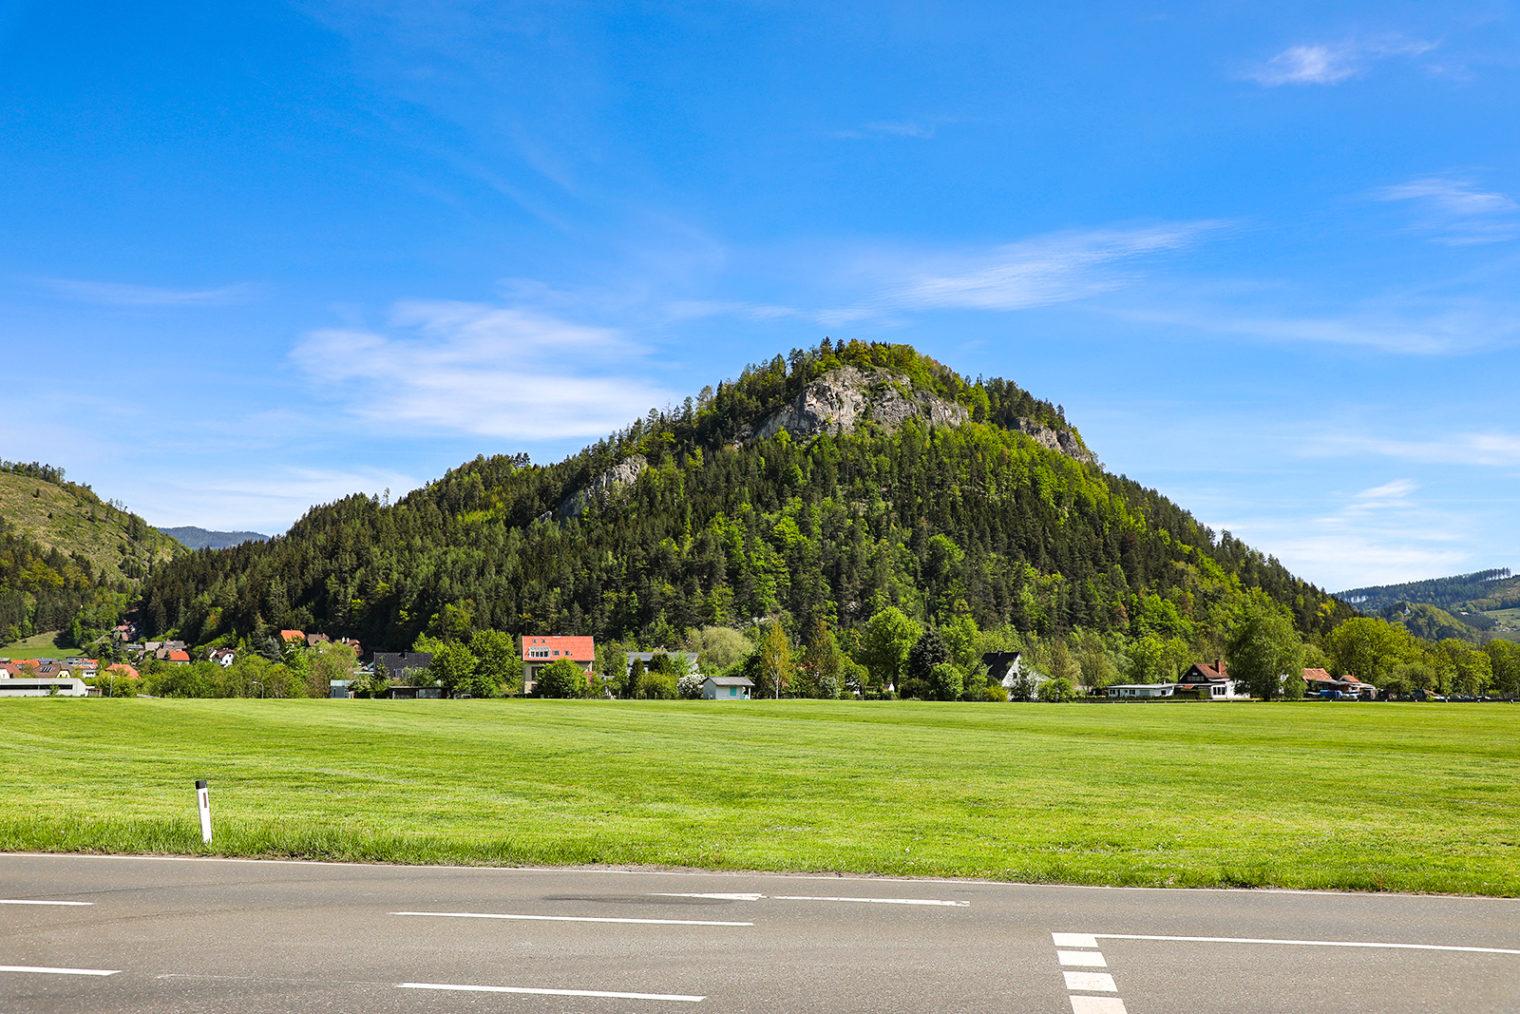 Häuselberg in Leoben-Hinterberg